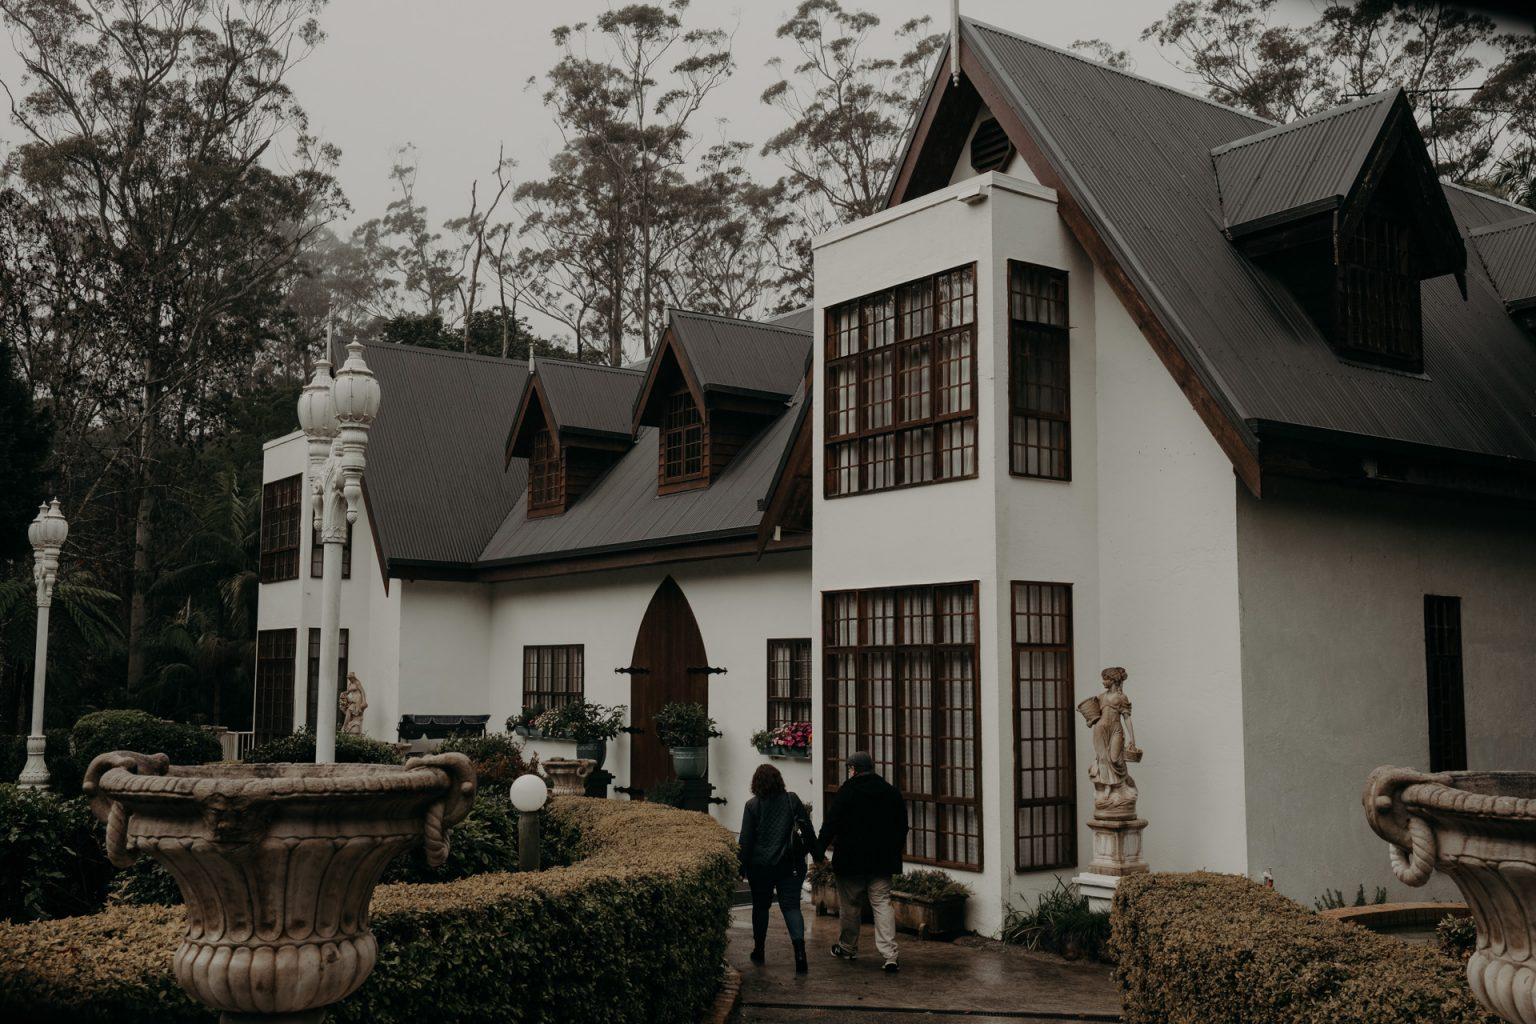 stonehaven manor mt tamborine